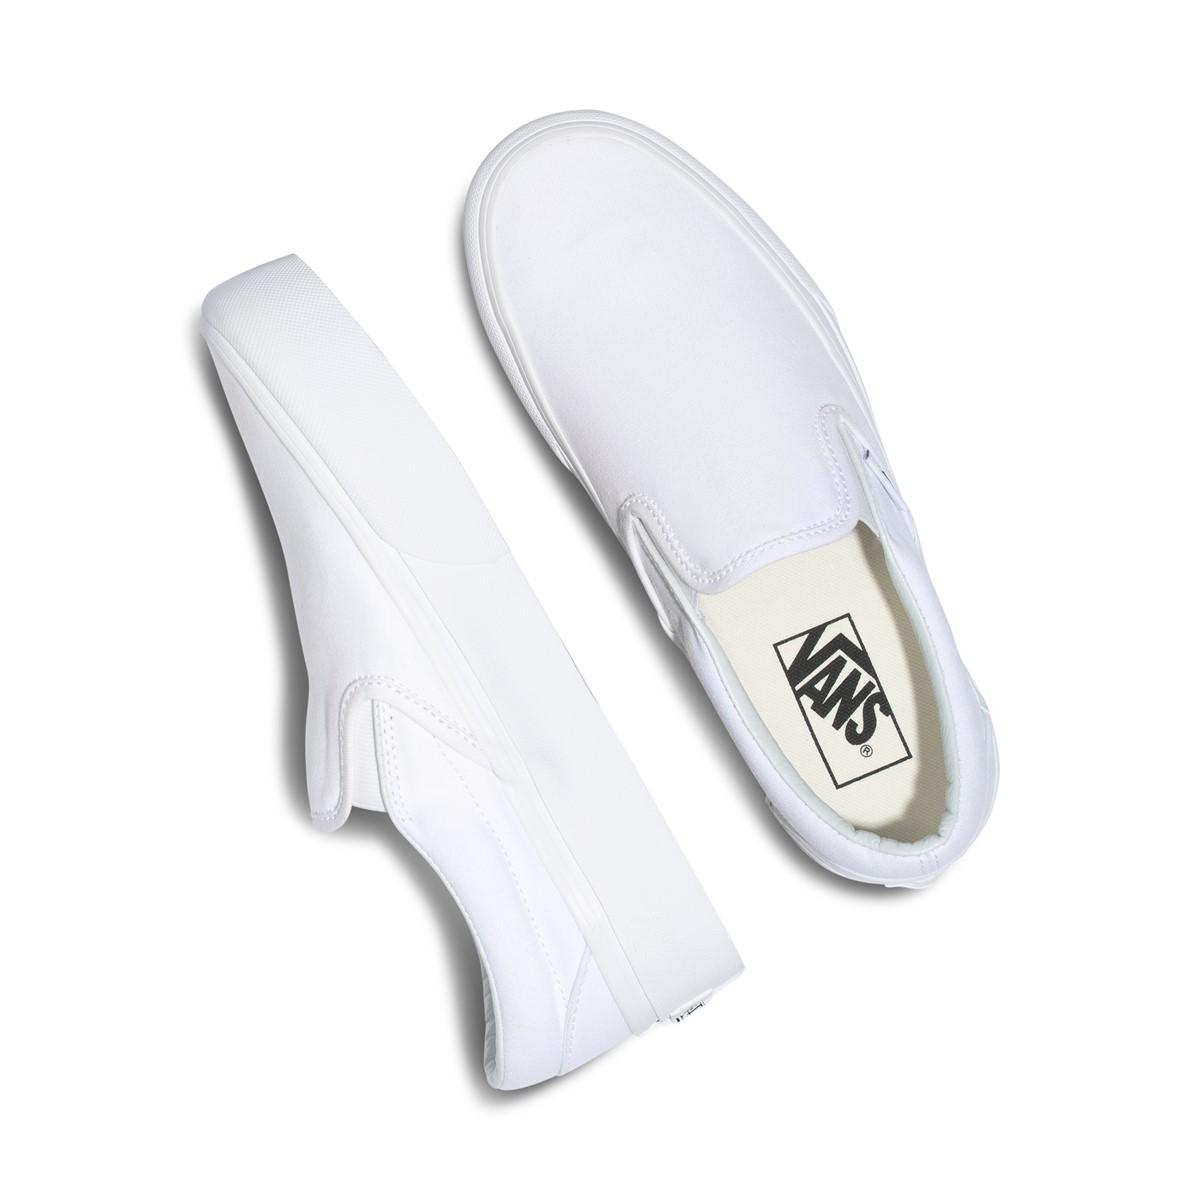 Baskets Platform Slip-Ons blanches pour femmes | Little Burgundy